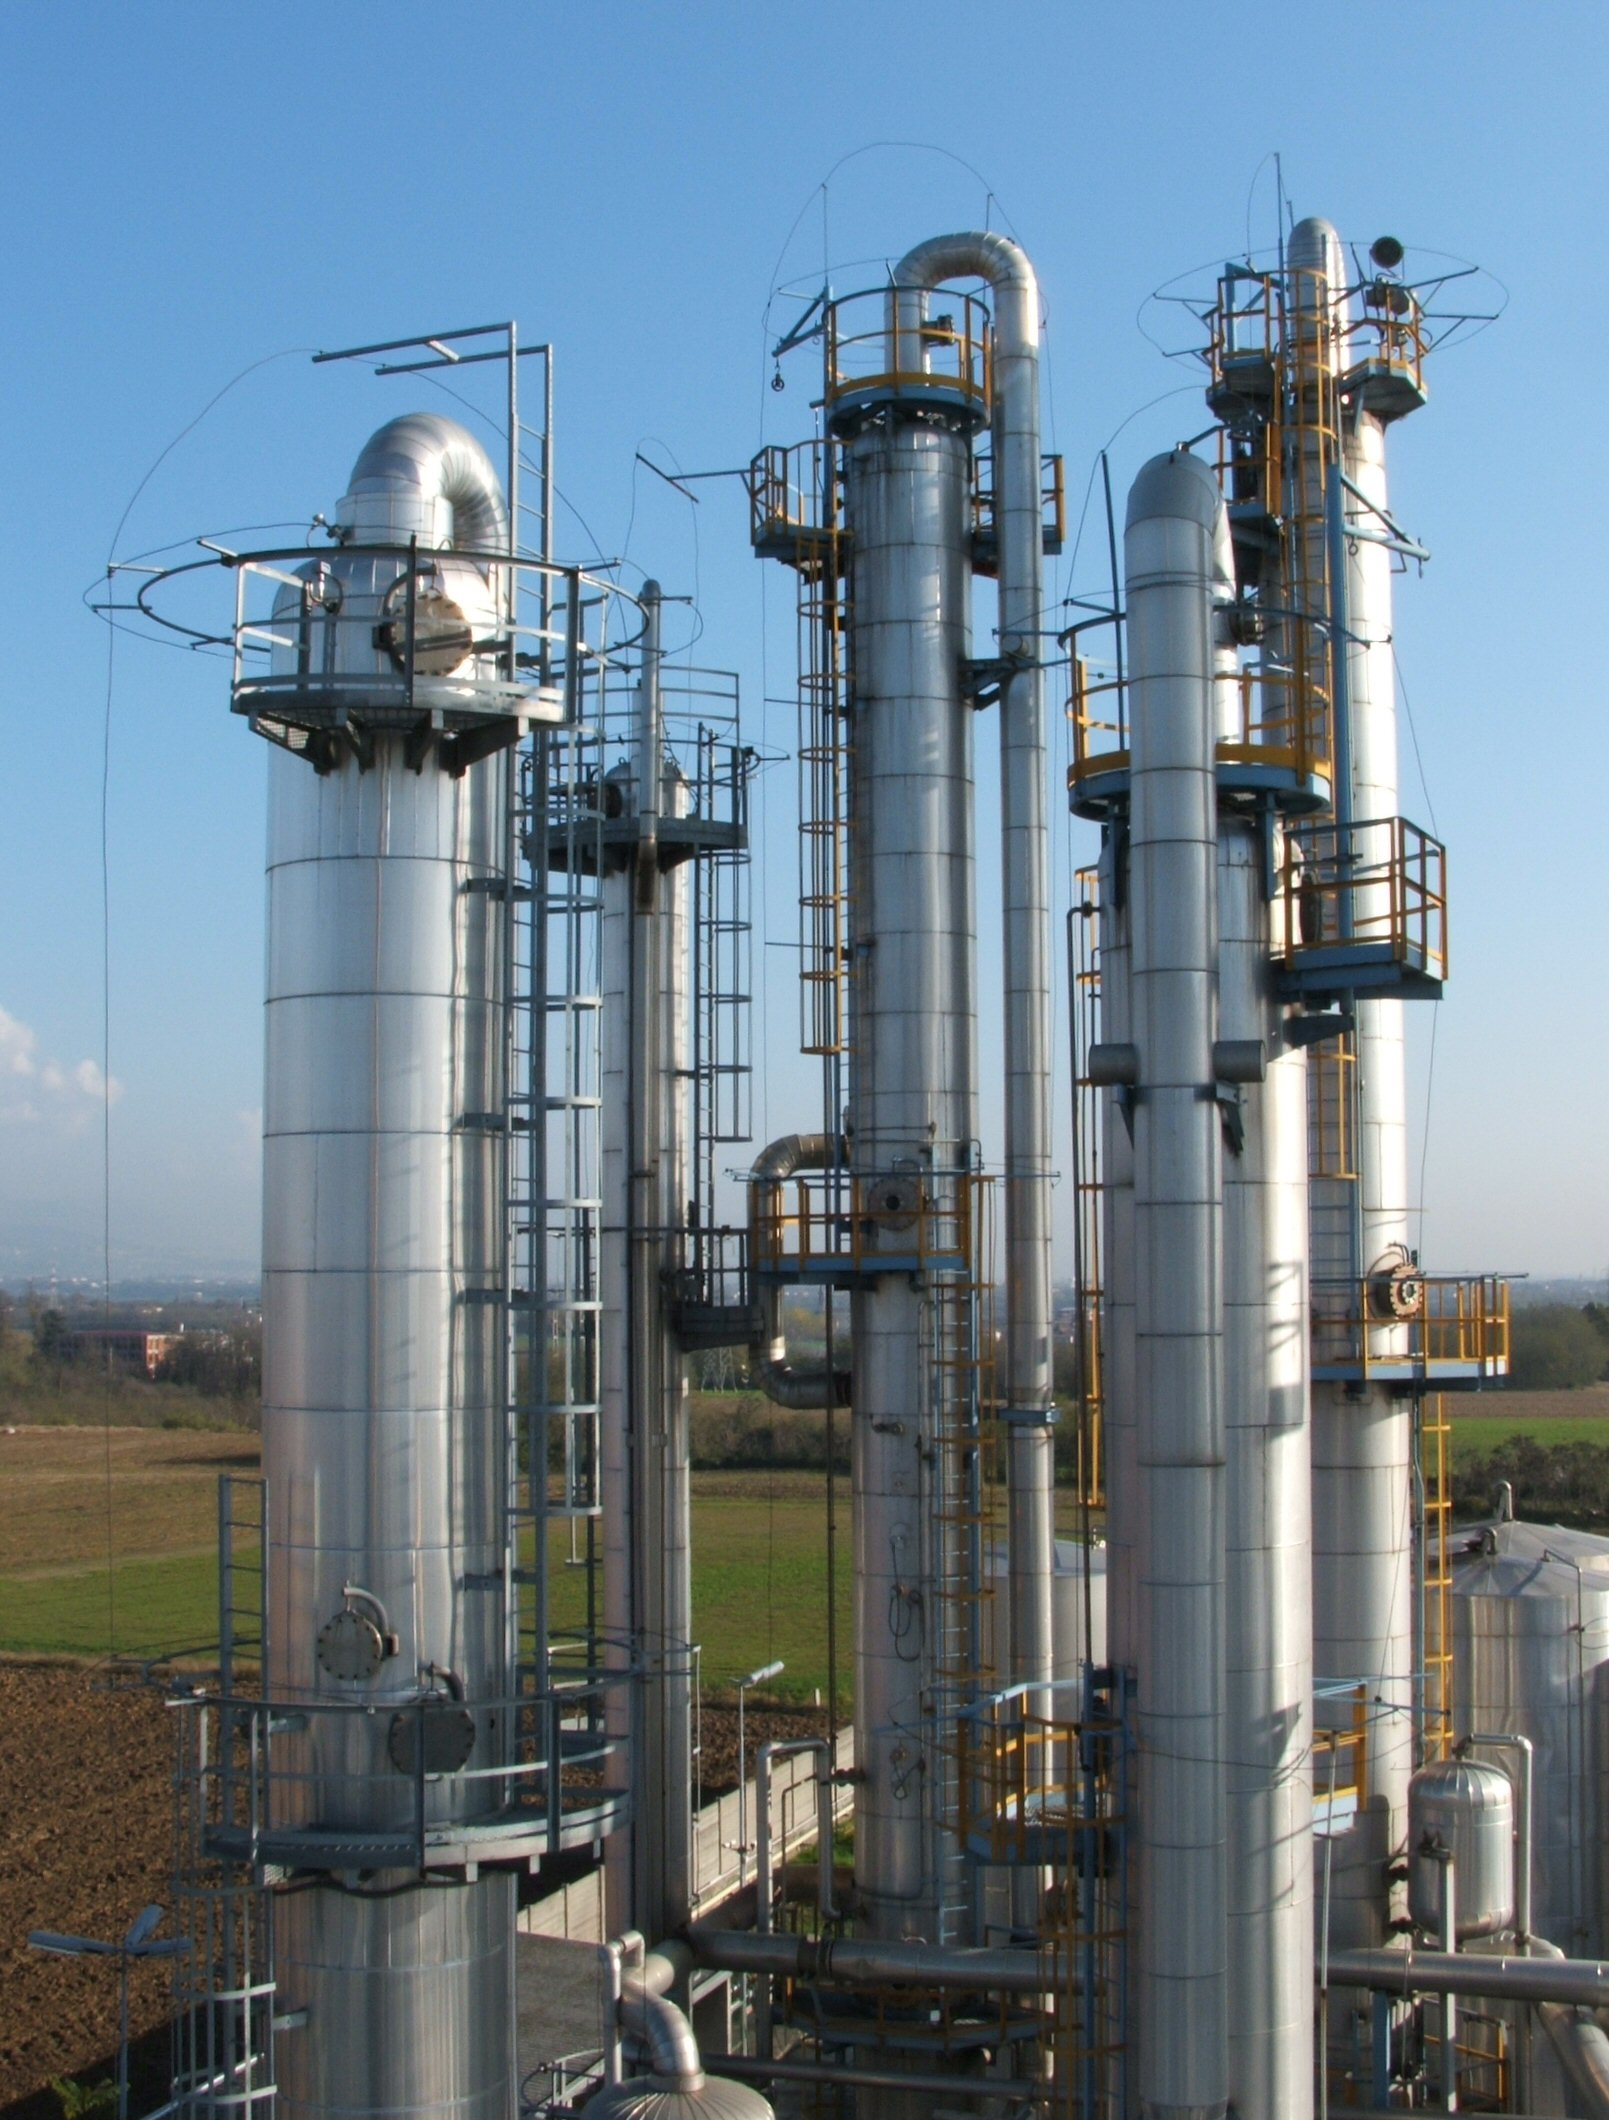 Seperating cyclohexane and toluene by distillation understanding